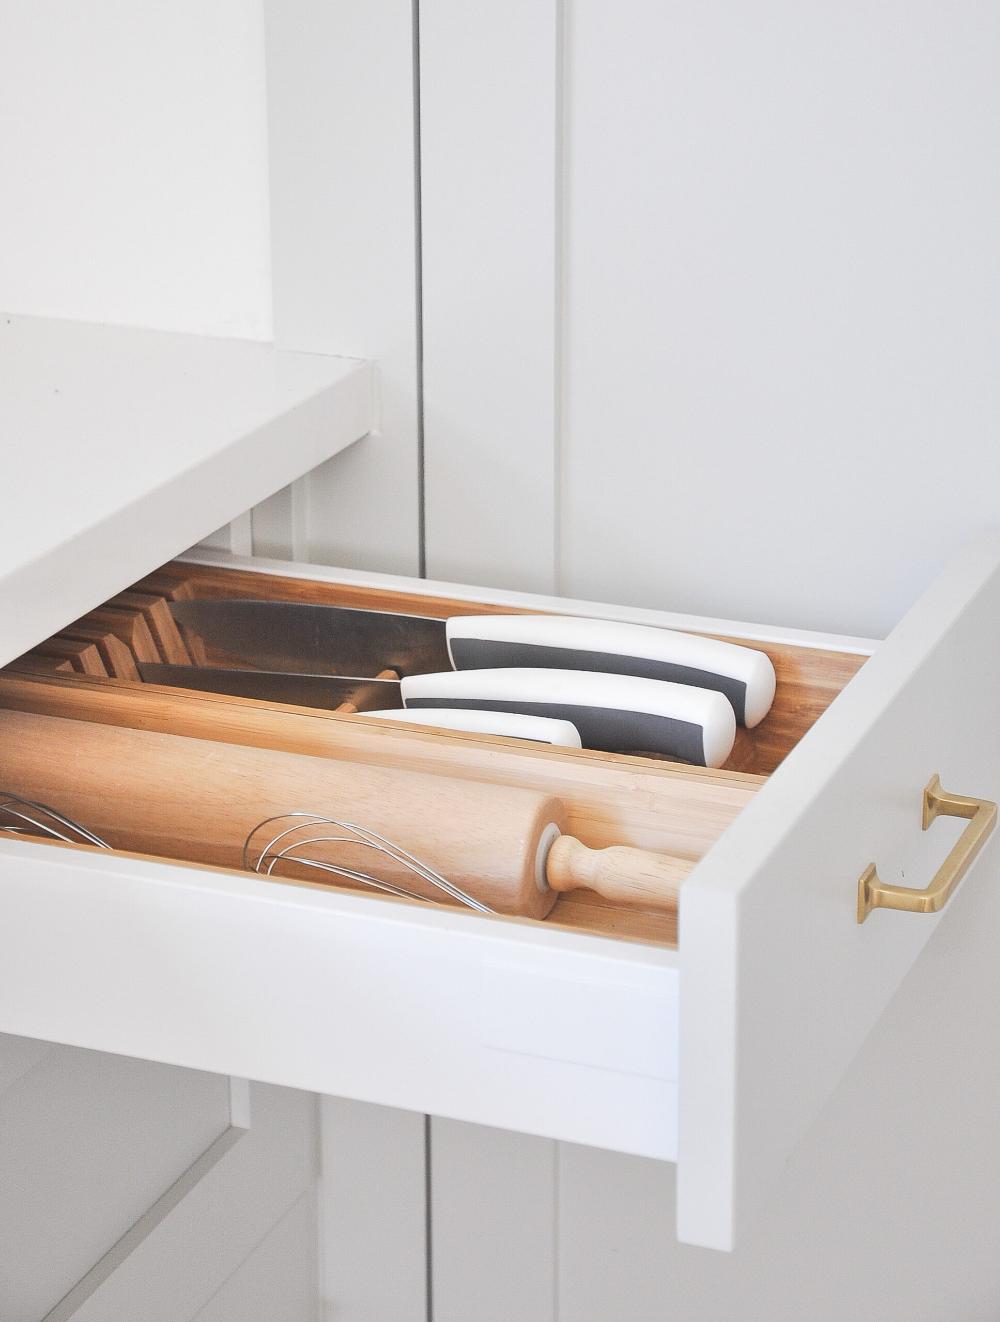 4 Ikea Kitchen Organization Tips To Optimize Your Cabinets Semistories In 2021 Ikea Kitchen Organization Ikea Kitchen Kitchen Hacks Organization